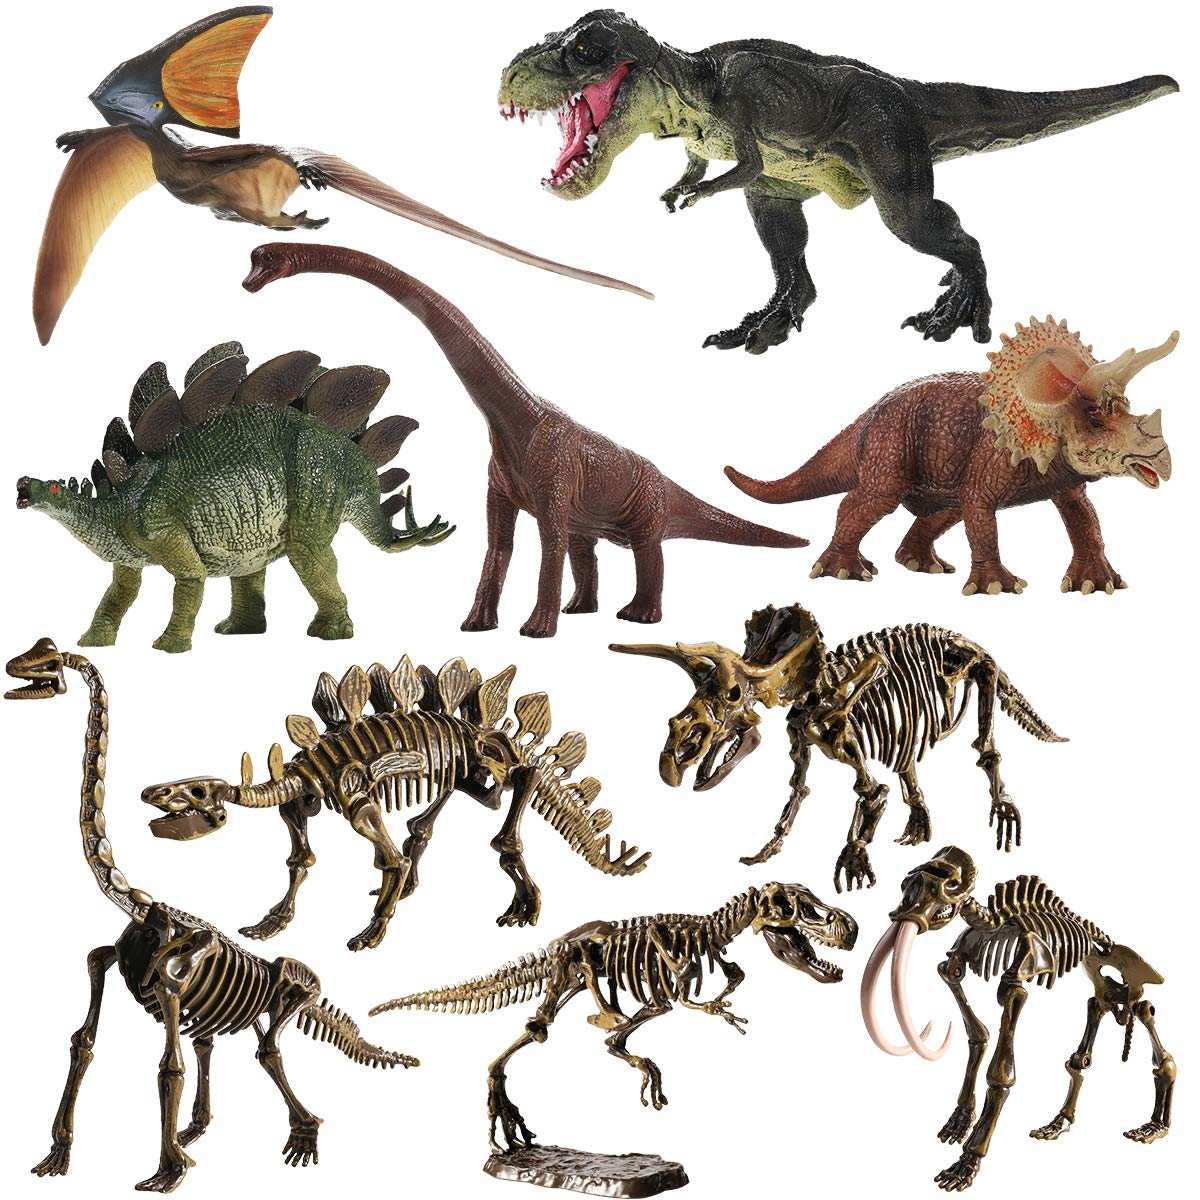 Geyiie 5pcs Realistic Dinosaur Toys Simulated Dinosaur Playset